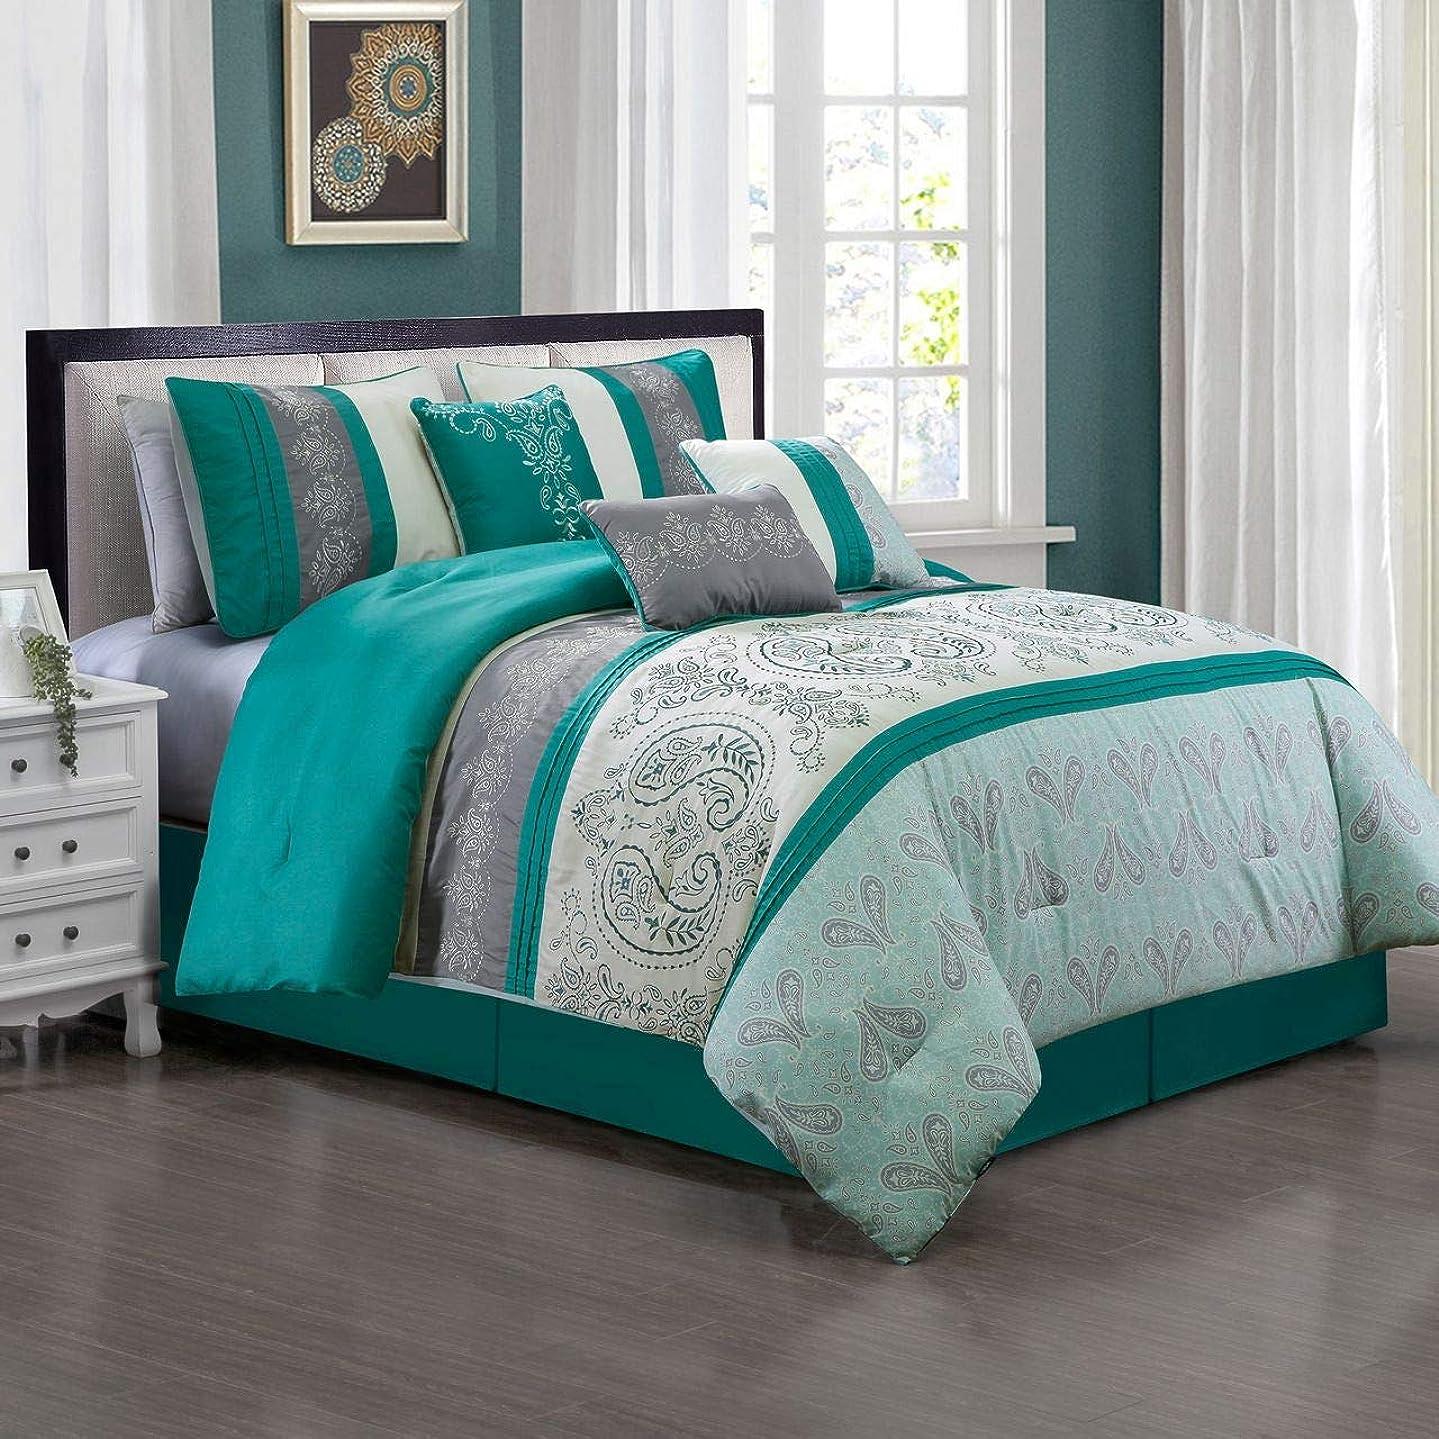 KingLinen 7 Piece Briallan Teal/Gray Comforter Set Queen